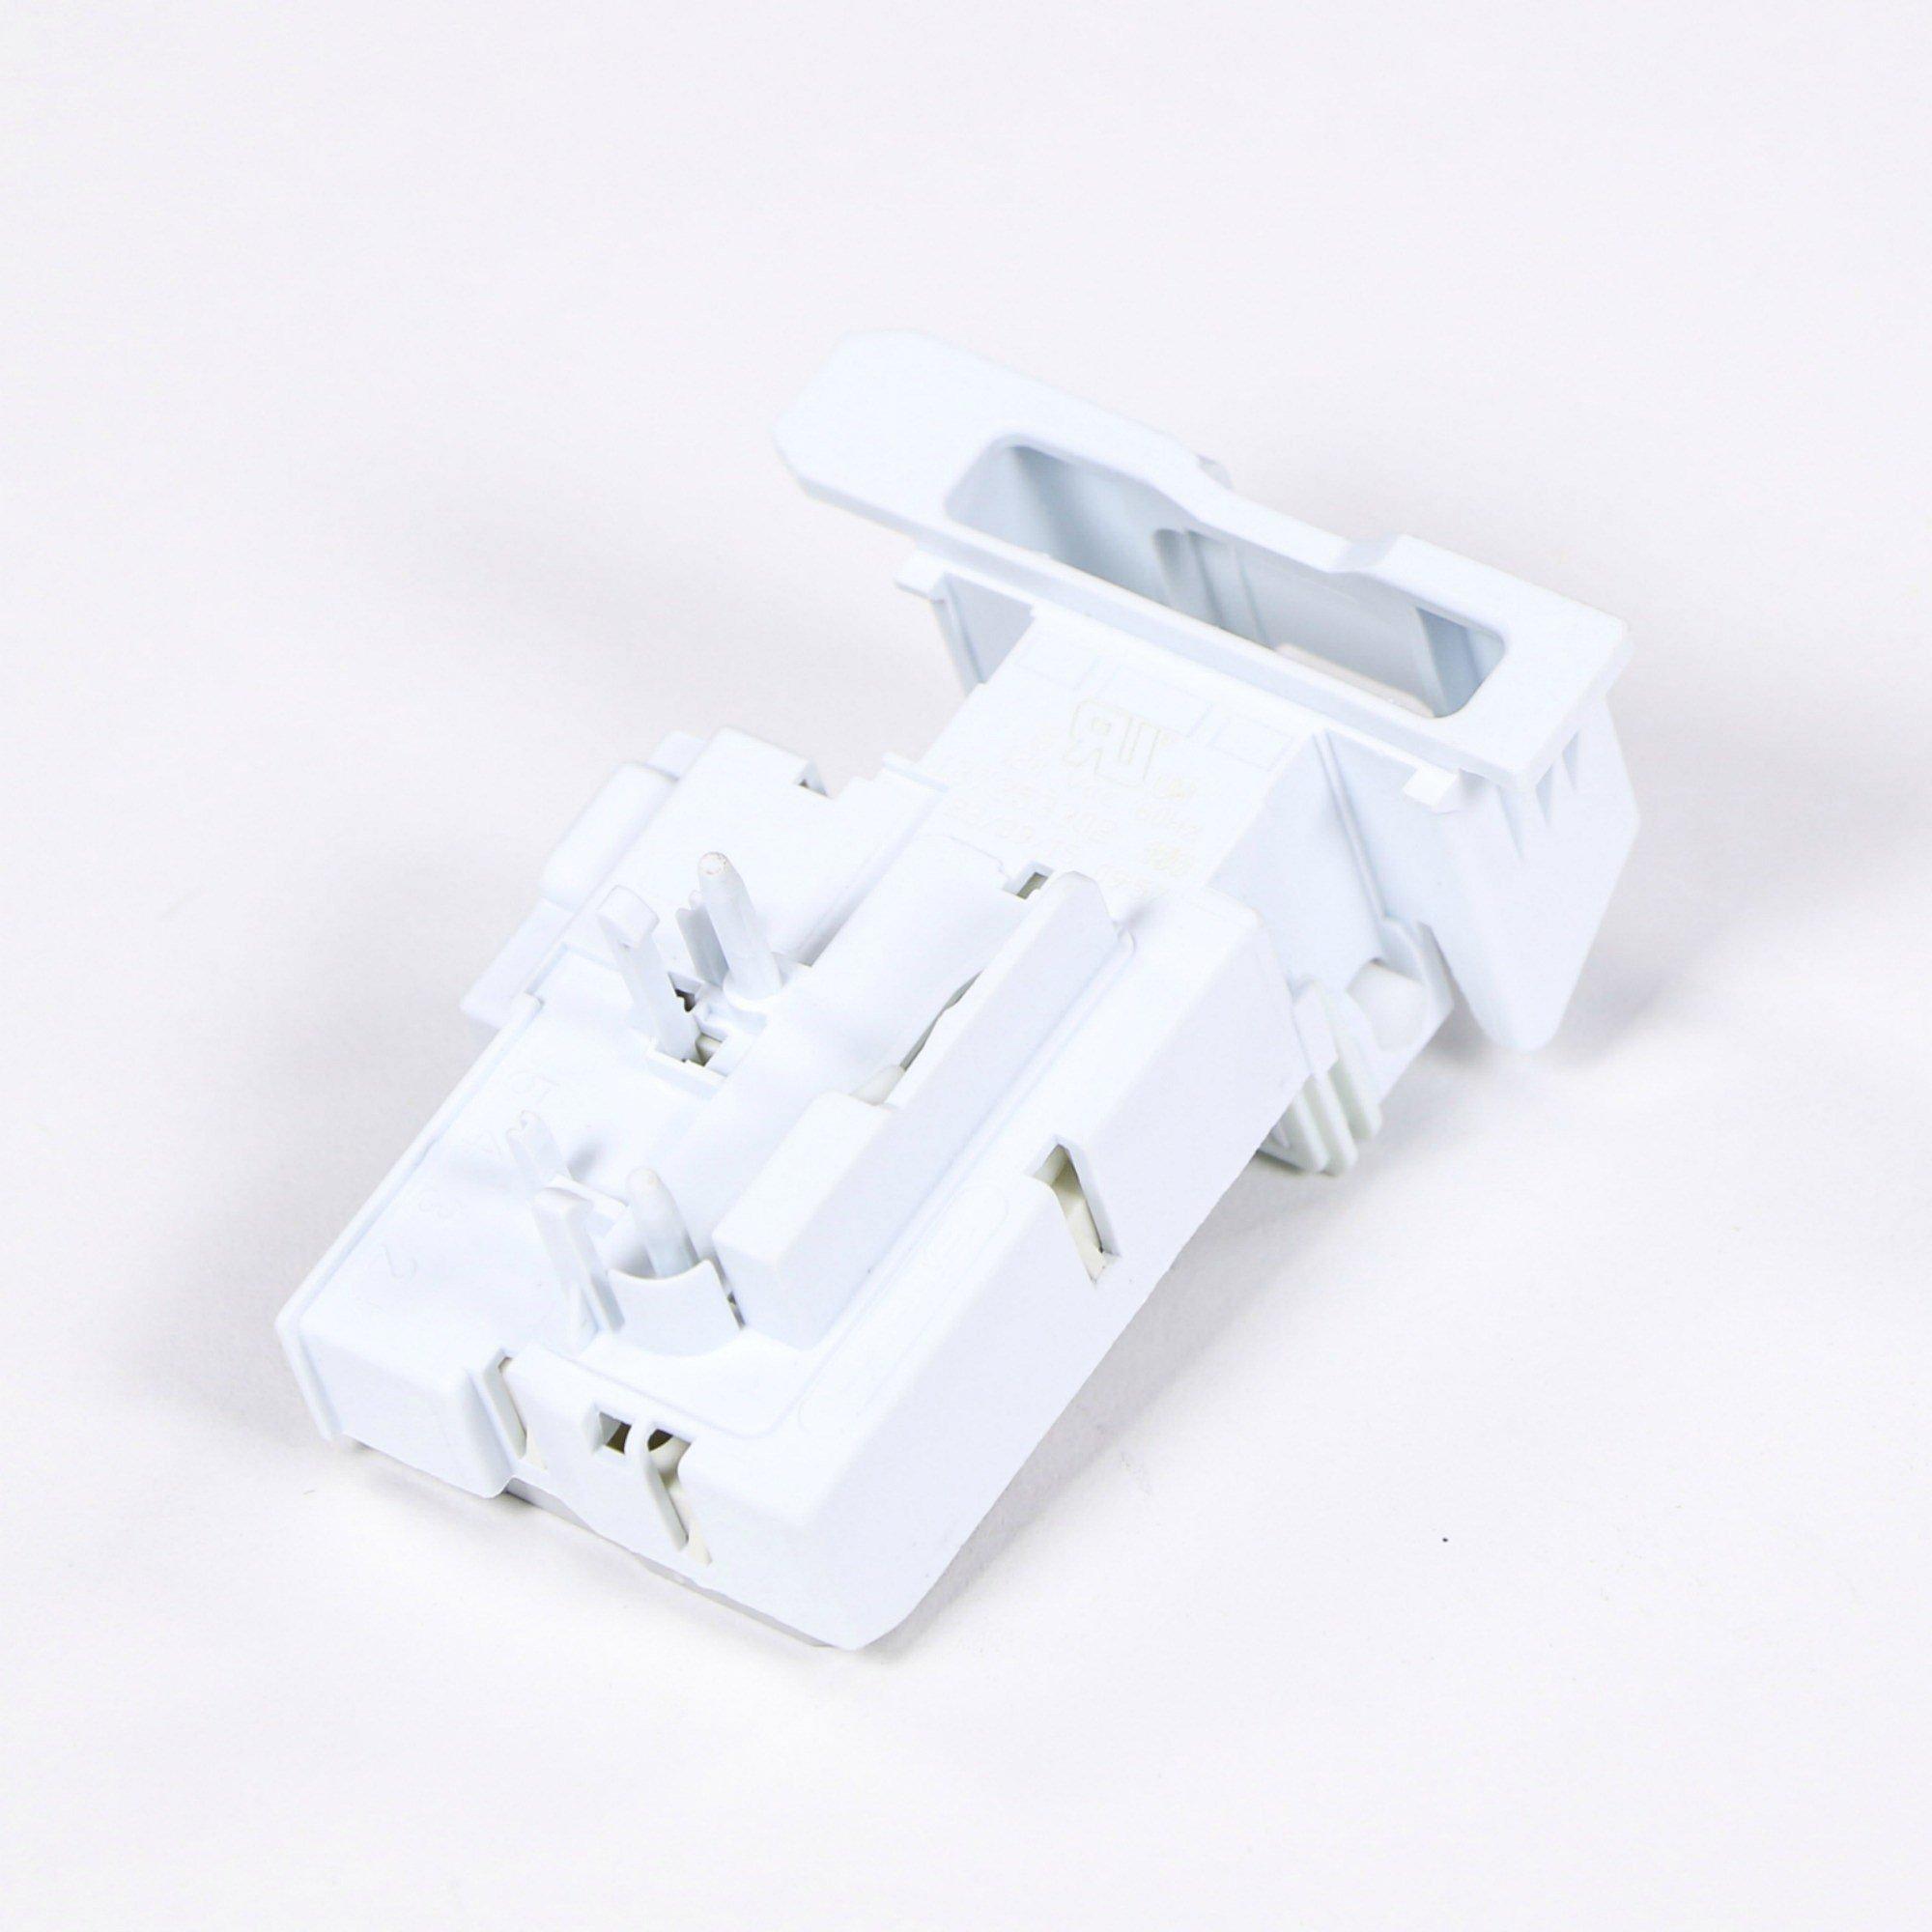 Frigidaire 137353302 Laundry Center Washer Lid Lock, White by FRIGIDAIRE (Image #1)